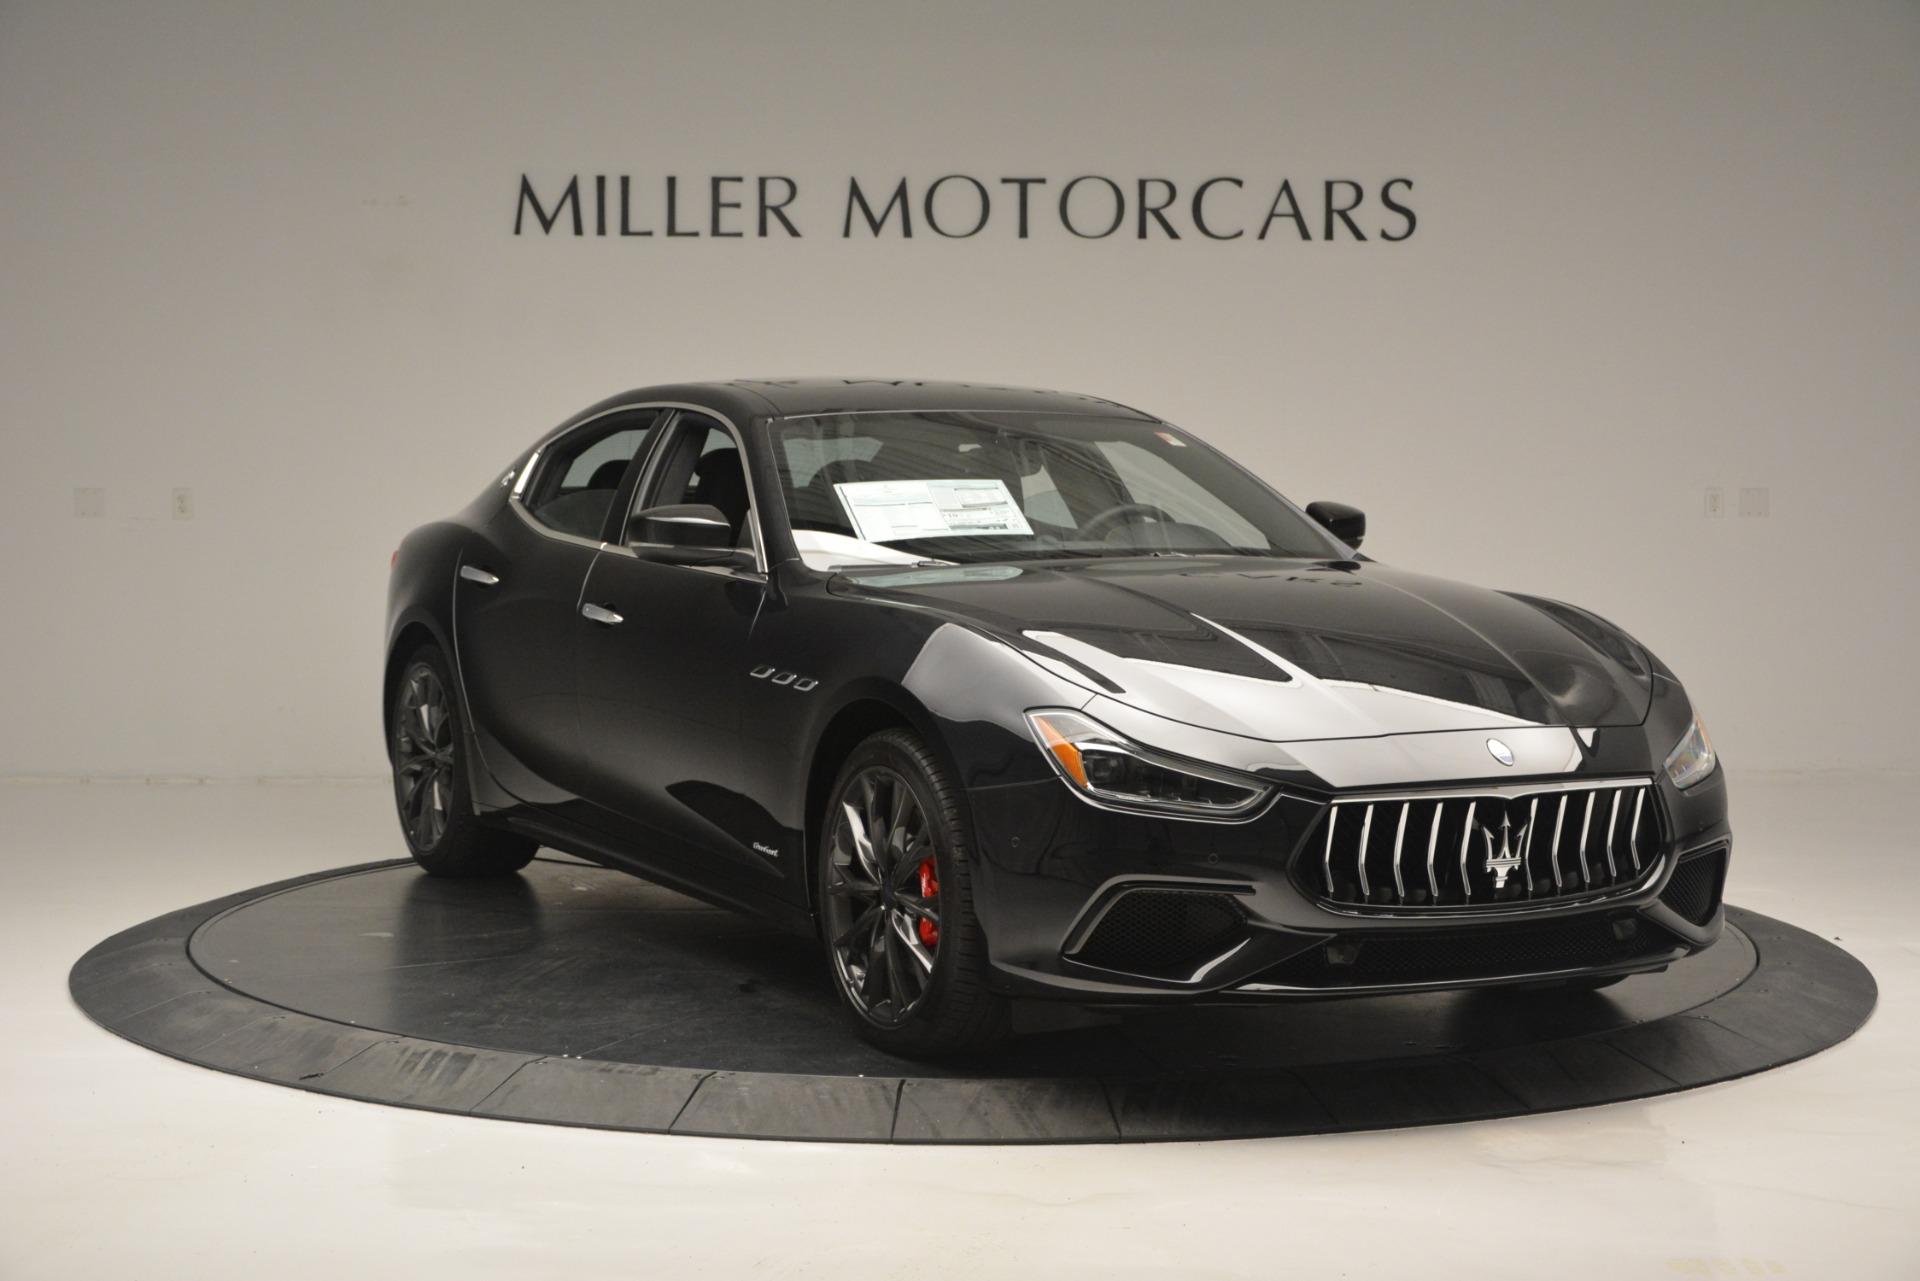 New 2019 Maserati Ghibli S Q4 GranSport For Sale In Westport, CT 2588_p11